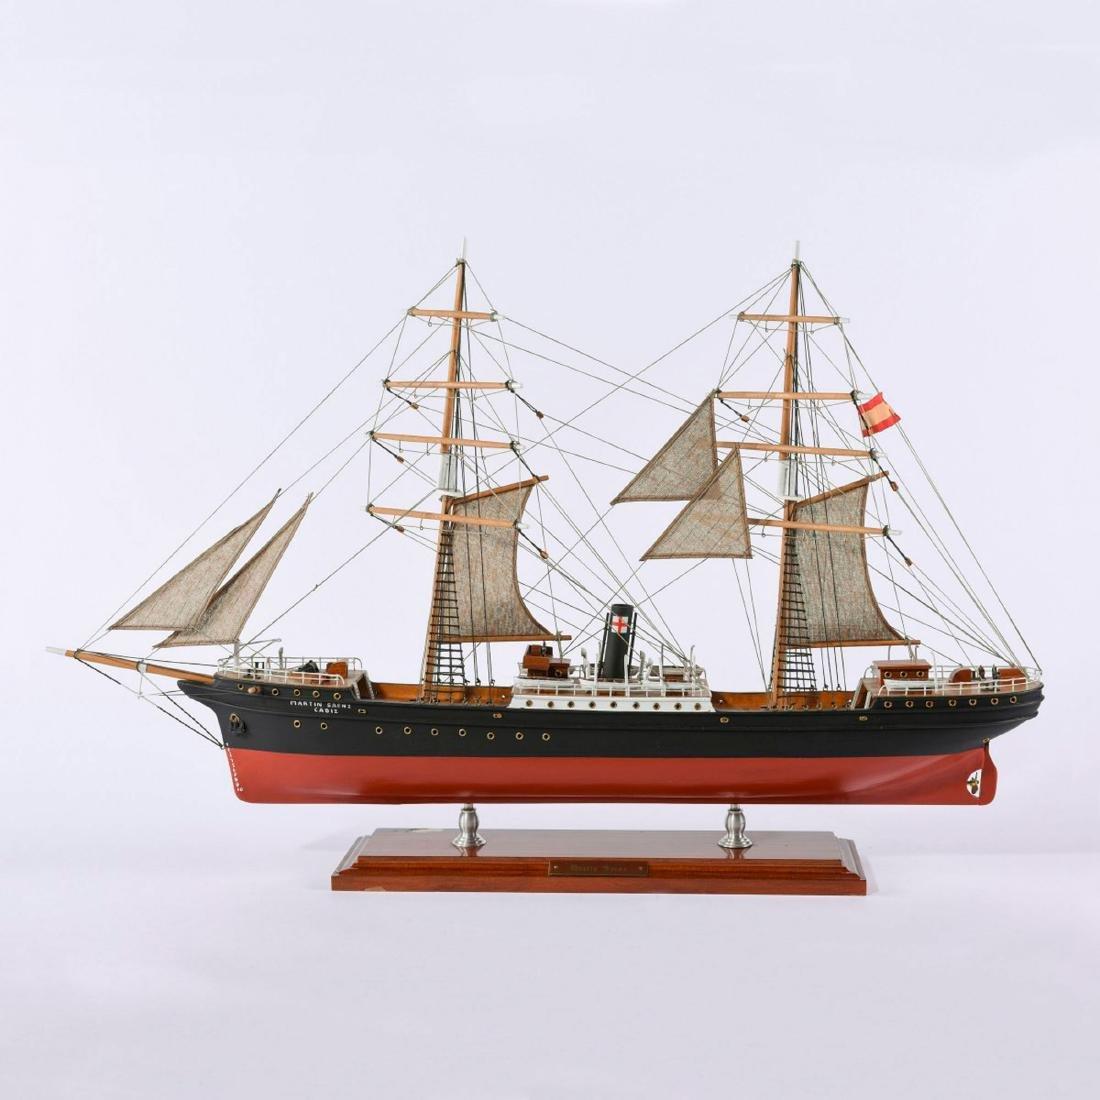 Model screw steamer 'Martin Saenz'